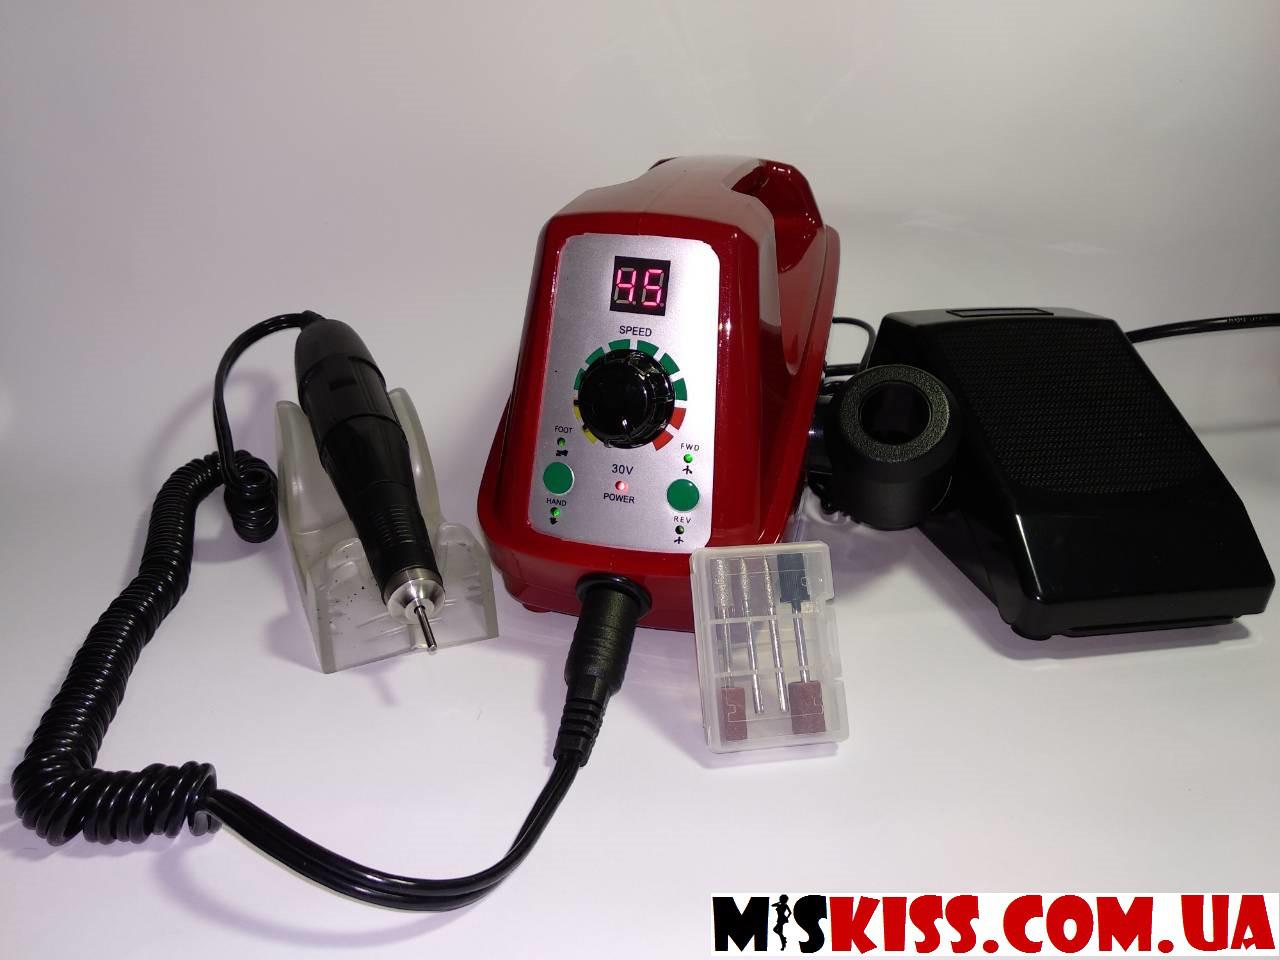 Фрезер для маникюра и педикюра с сенсором DM 013 80W